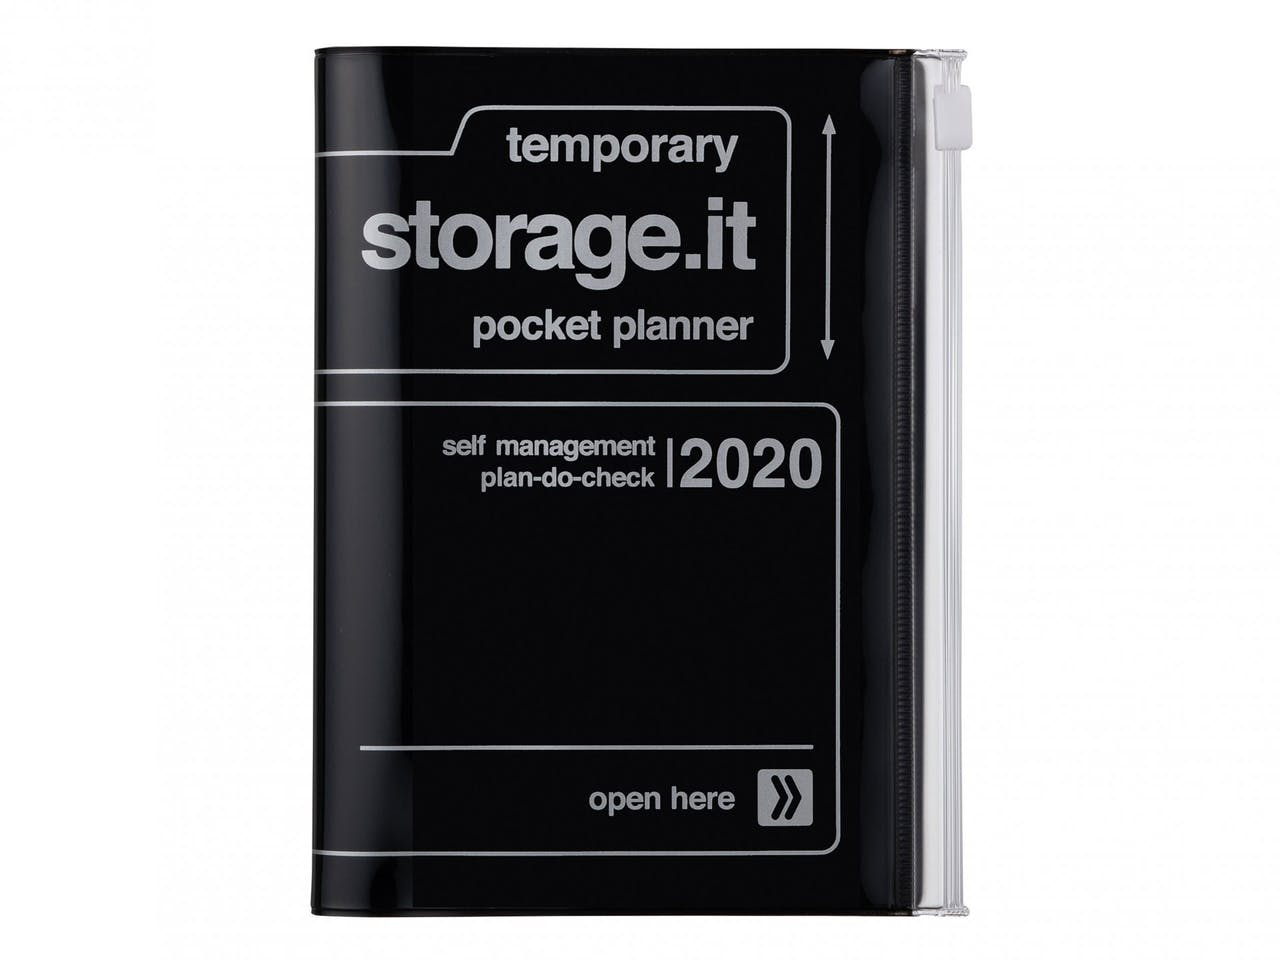 Mark's Wochenkalender 16 Mo Storage.it pocket plan